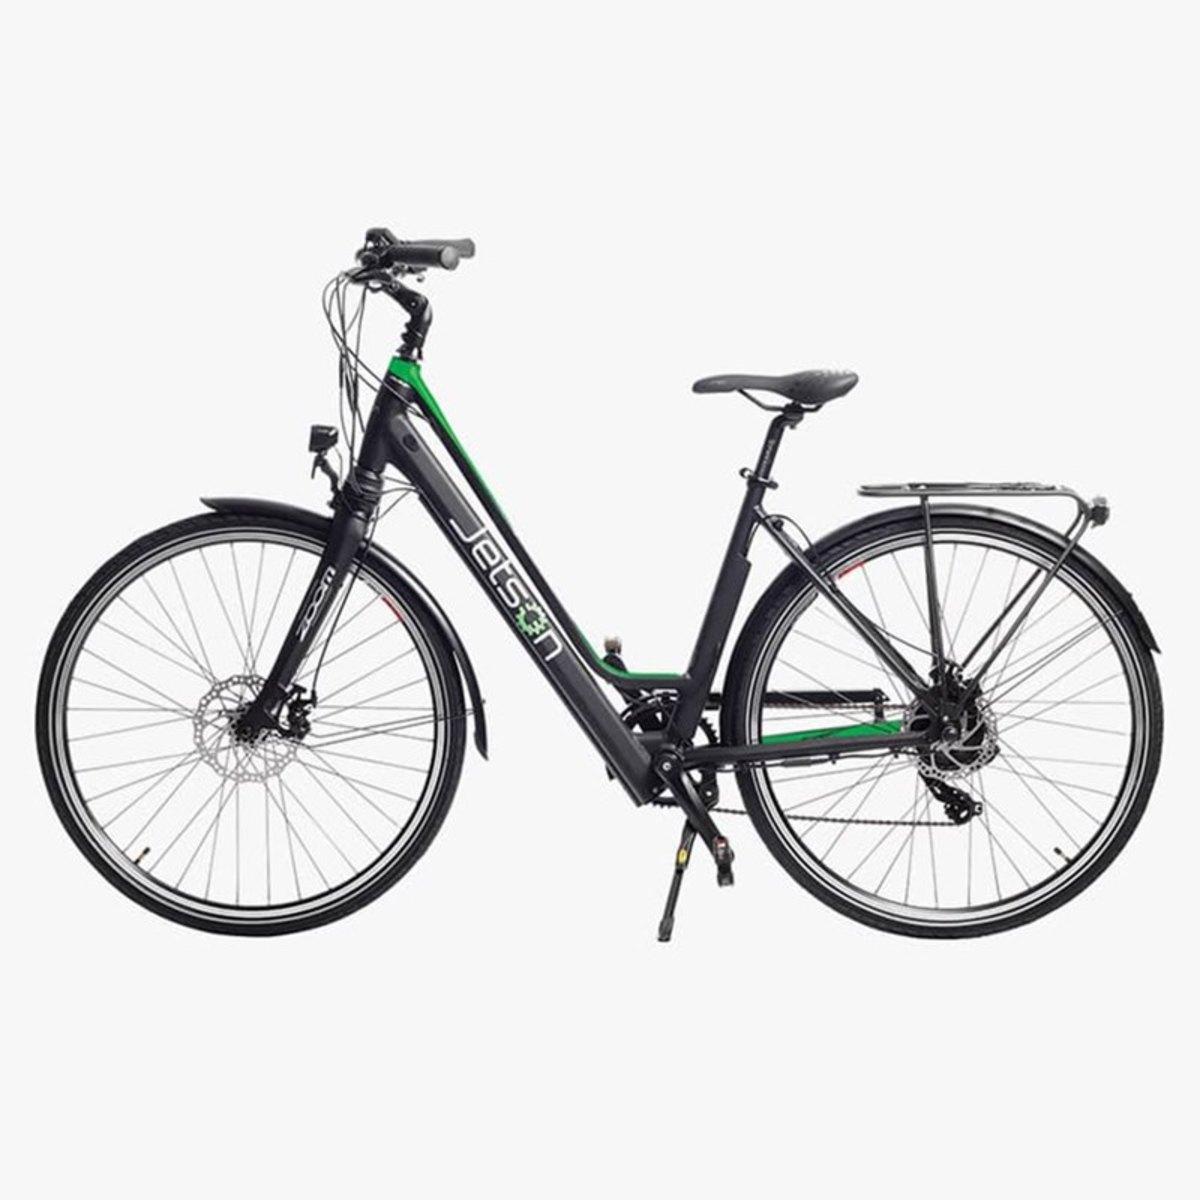 Bicicleta Elétrica Jetson Journey Verde 700c